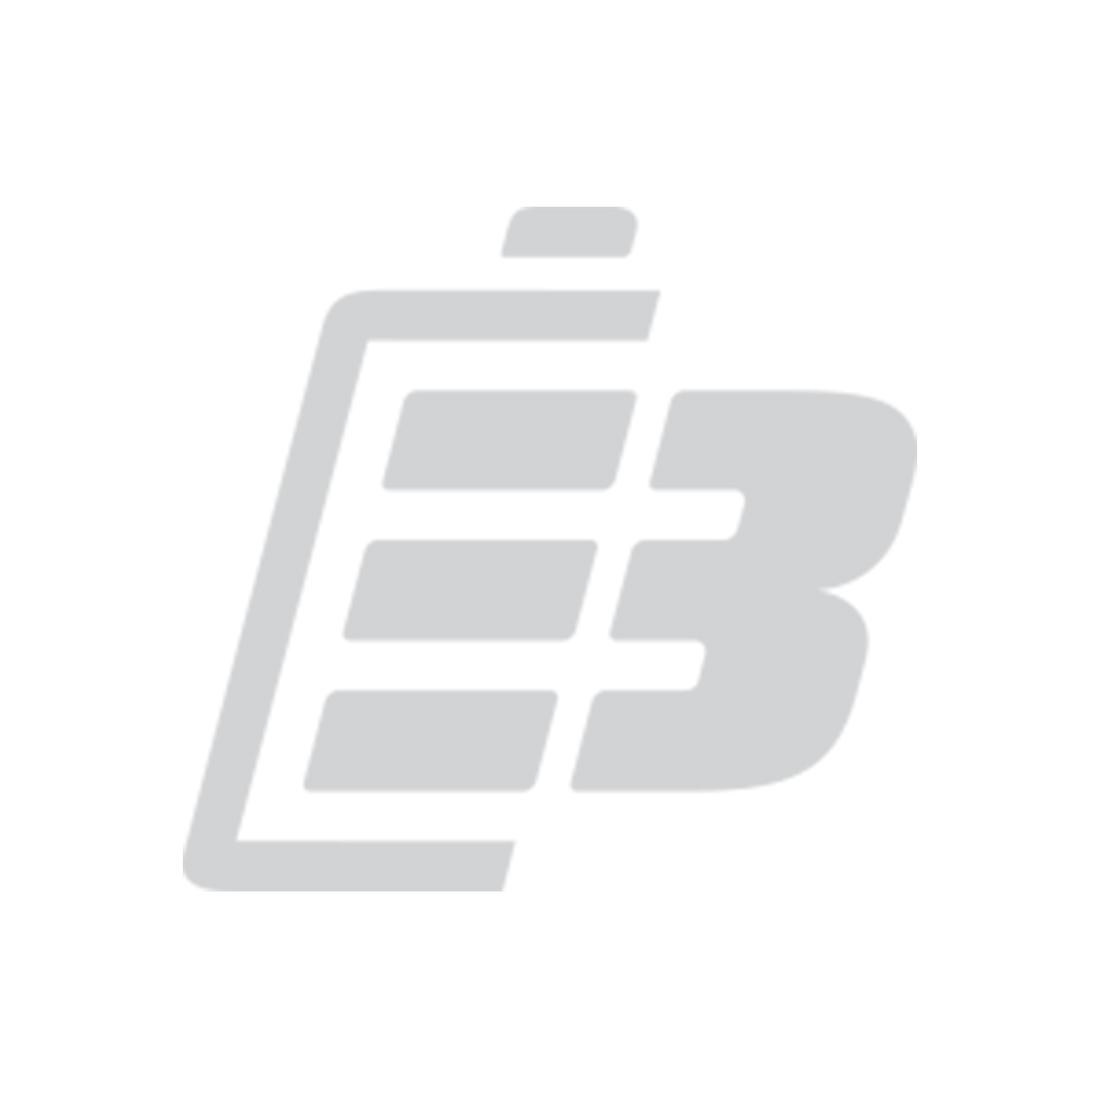 Tadiran SL-2770 C Lithium Battery 1